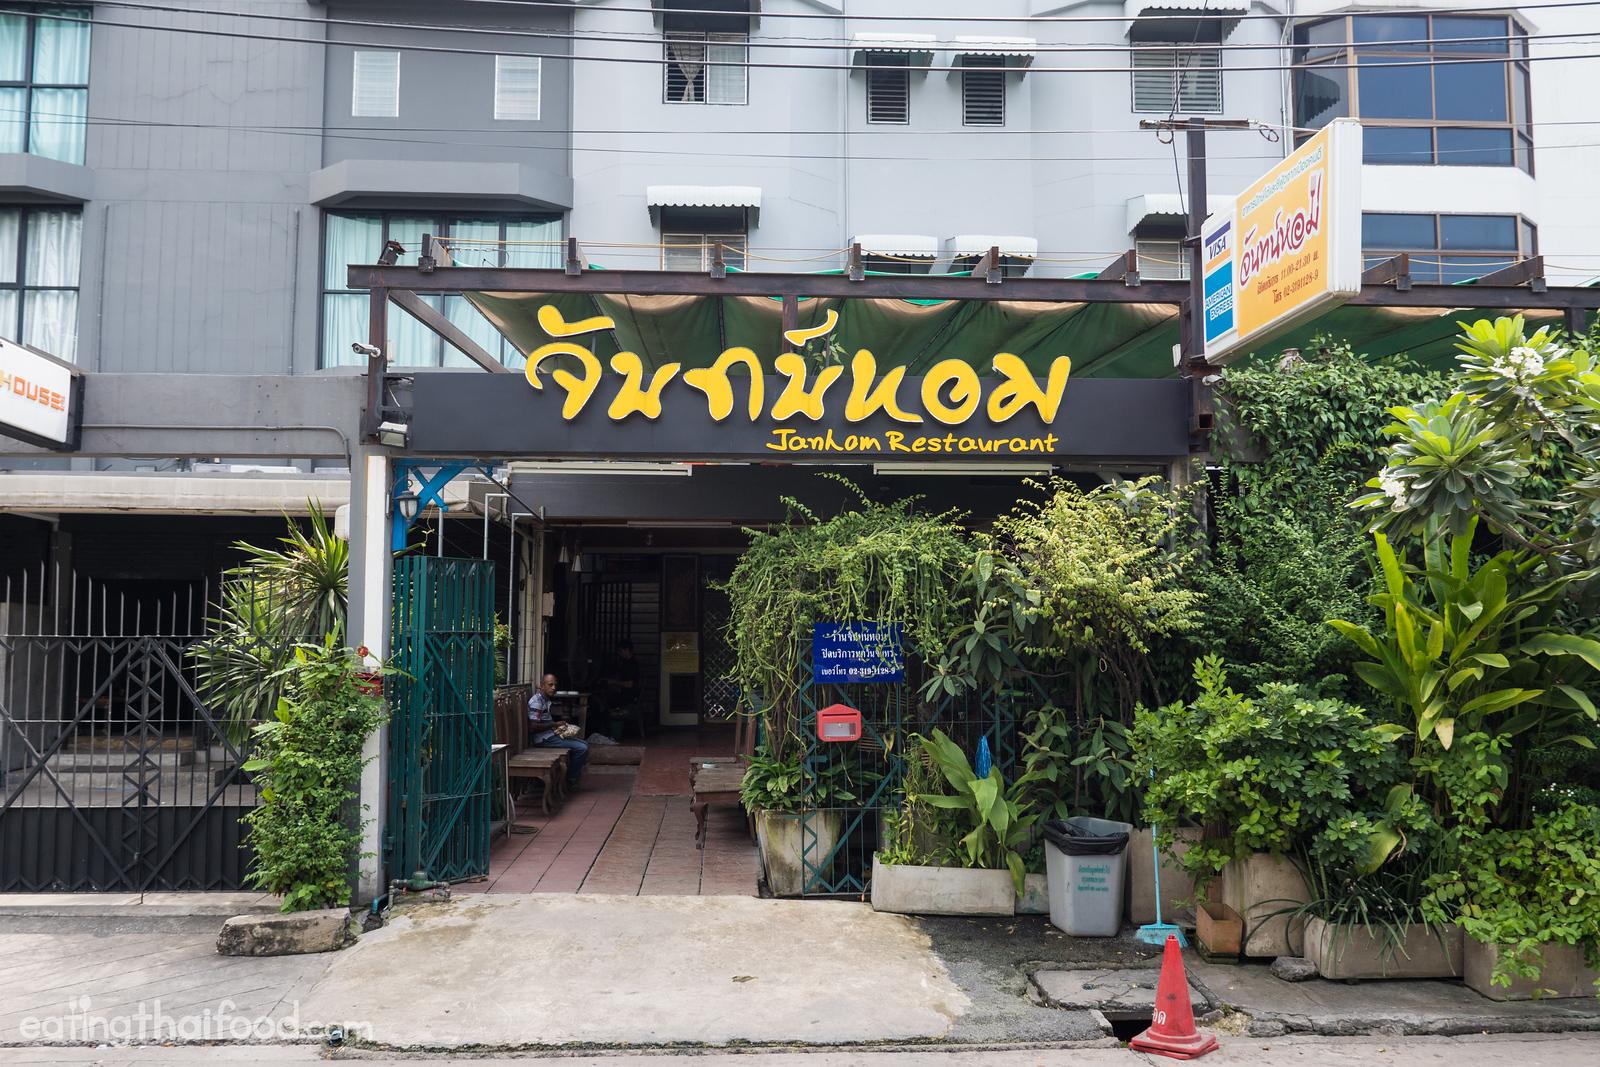 Janhom Restaurant (ร้านจันทร์หอม)